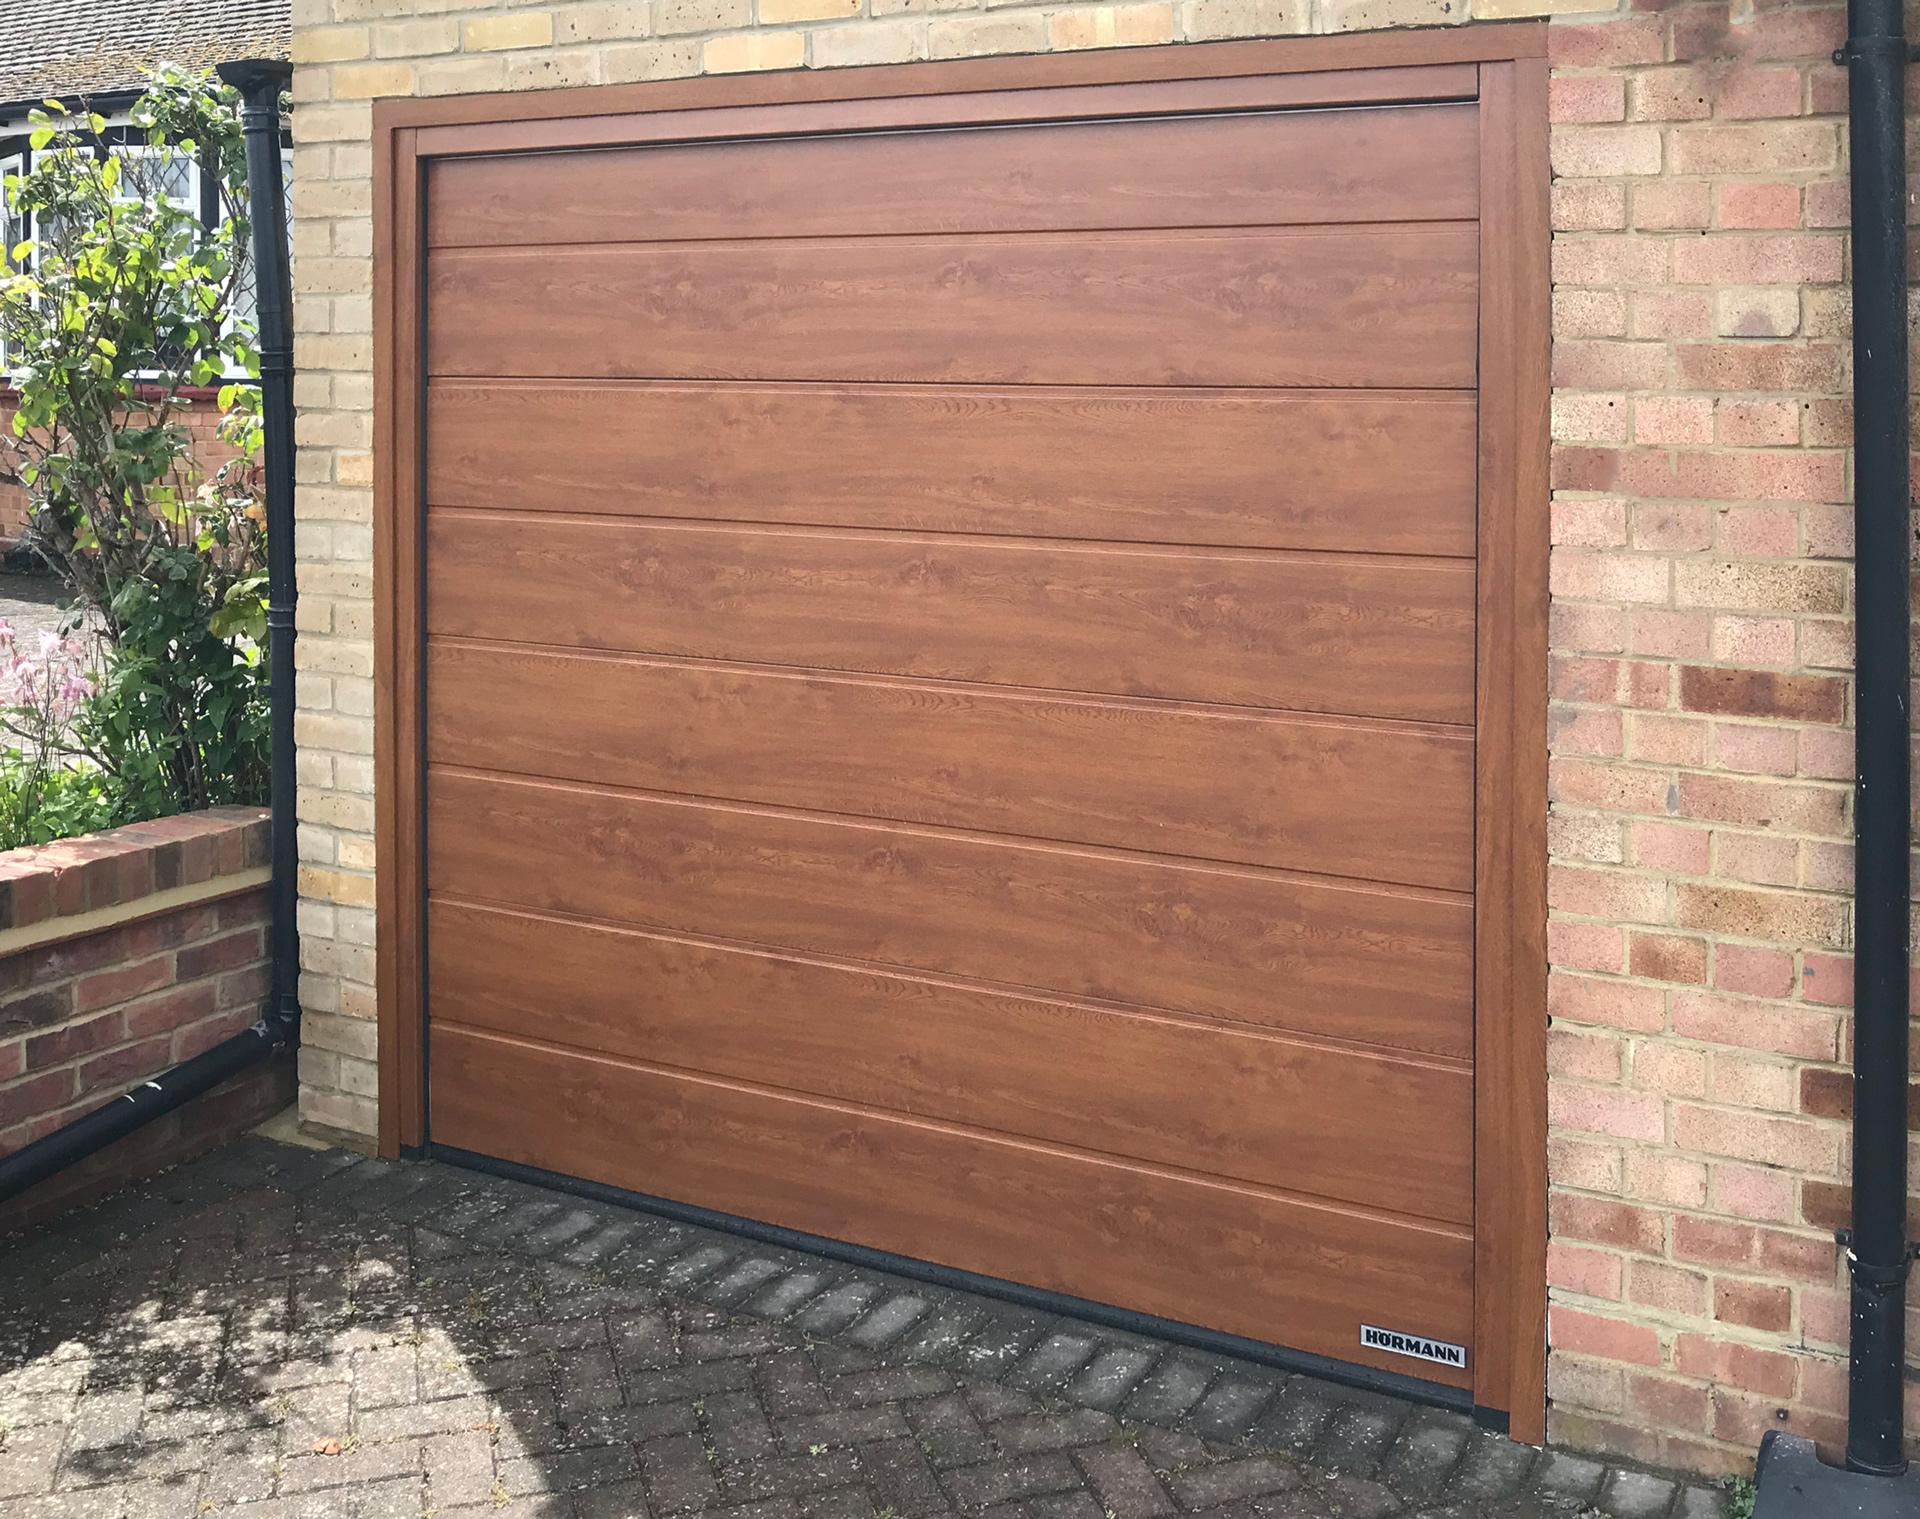 Hormann LPU42 M-Ribbed Sectional Garage Door finished in Golden Oak Decograin